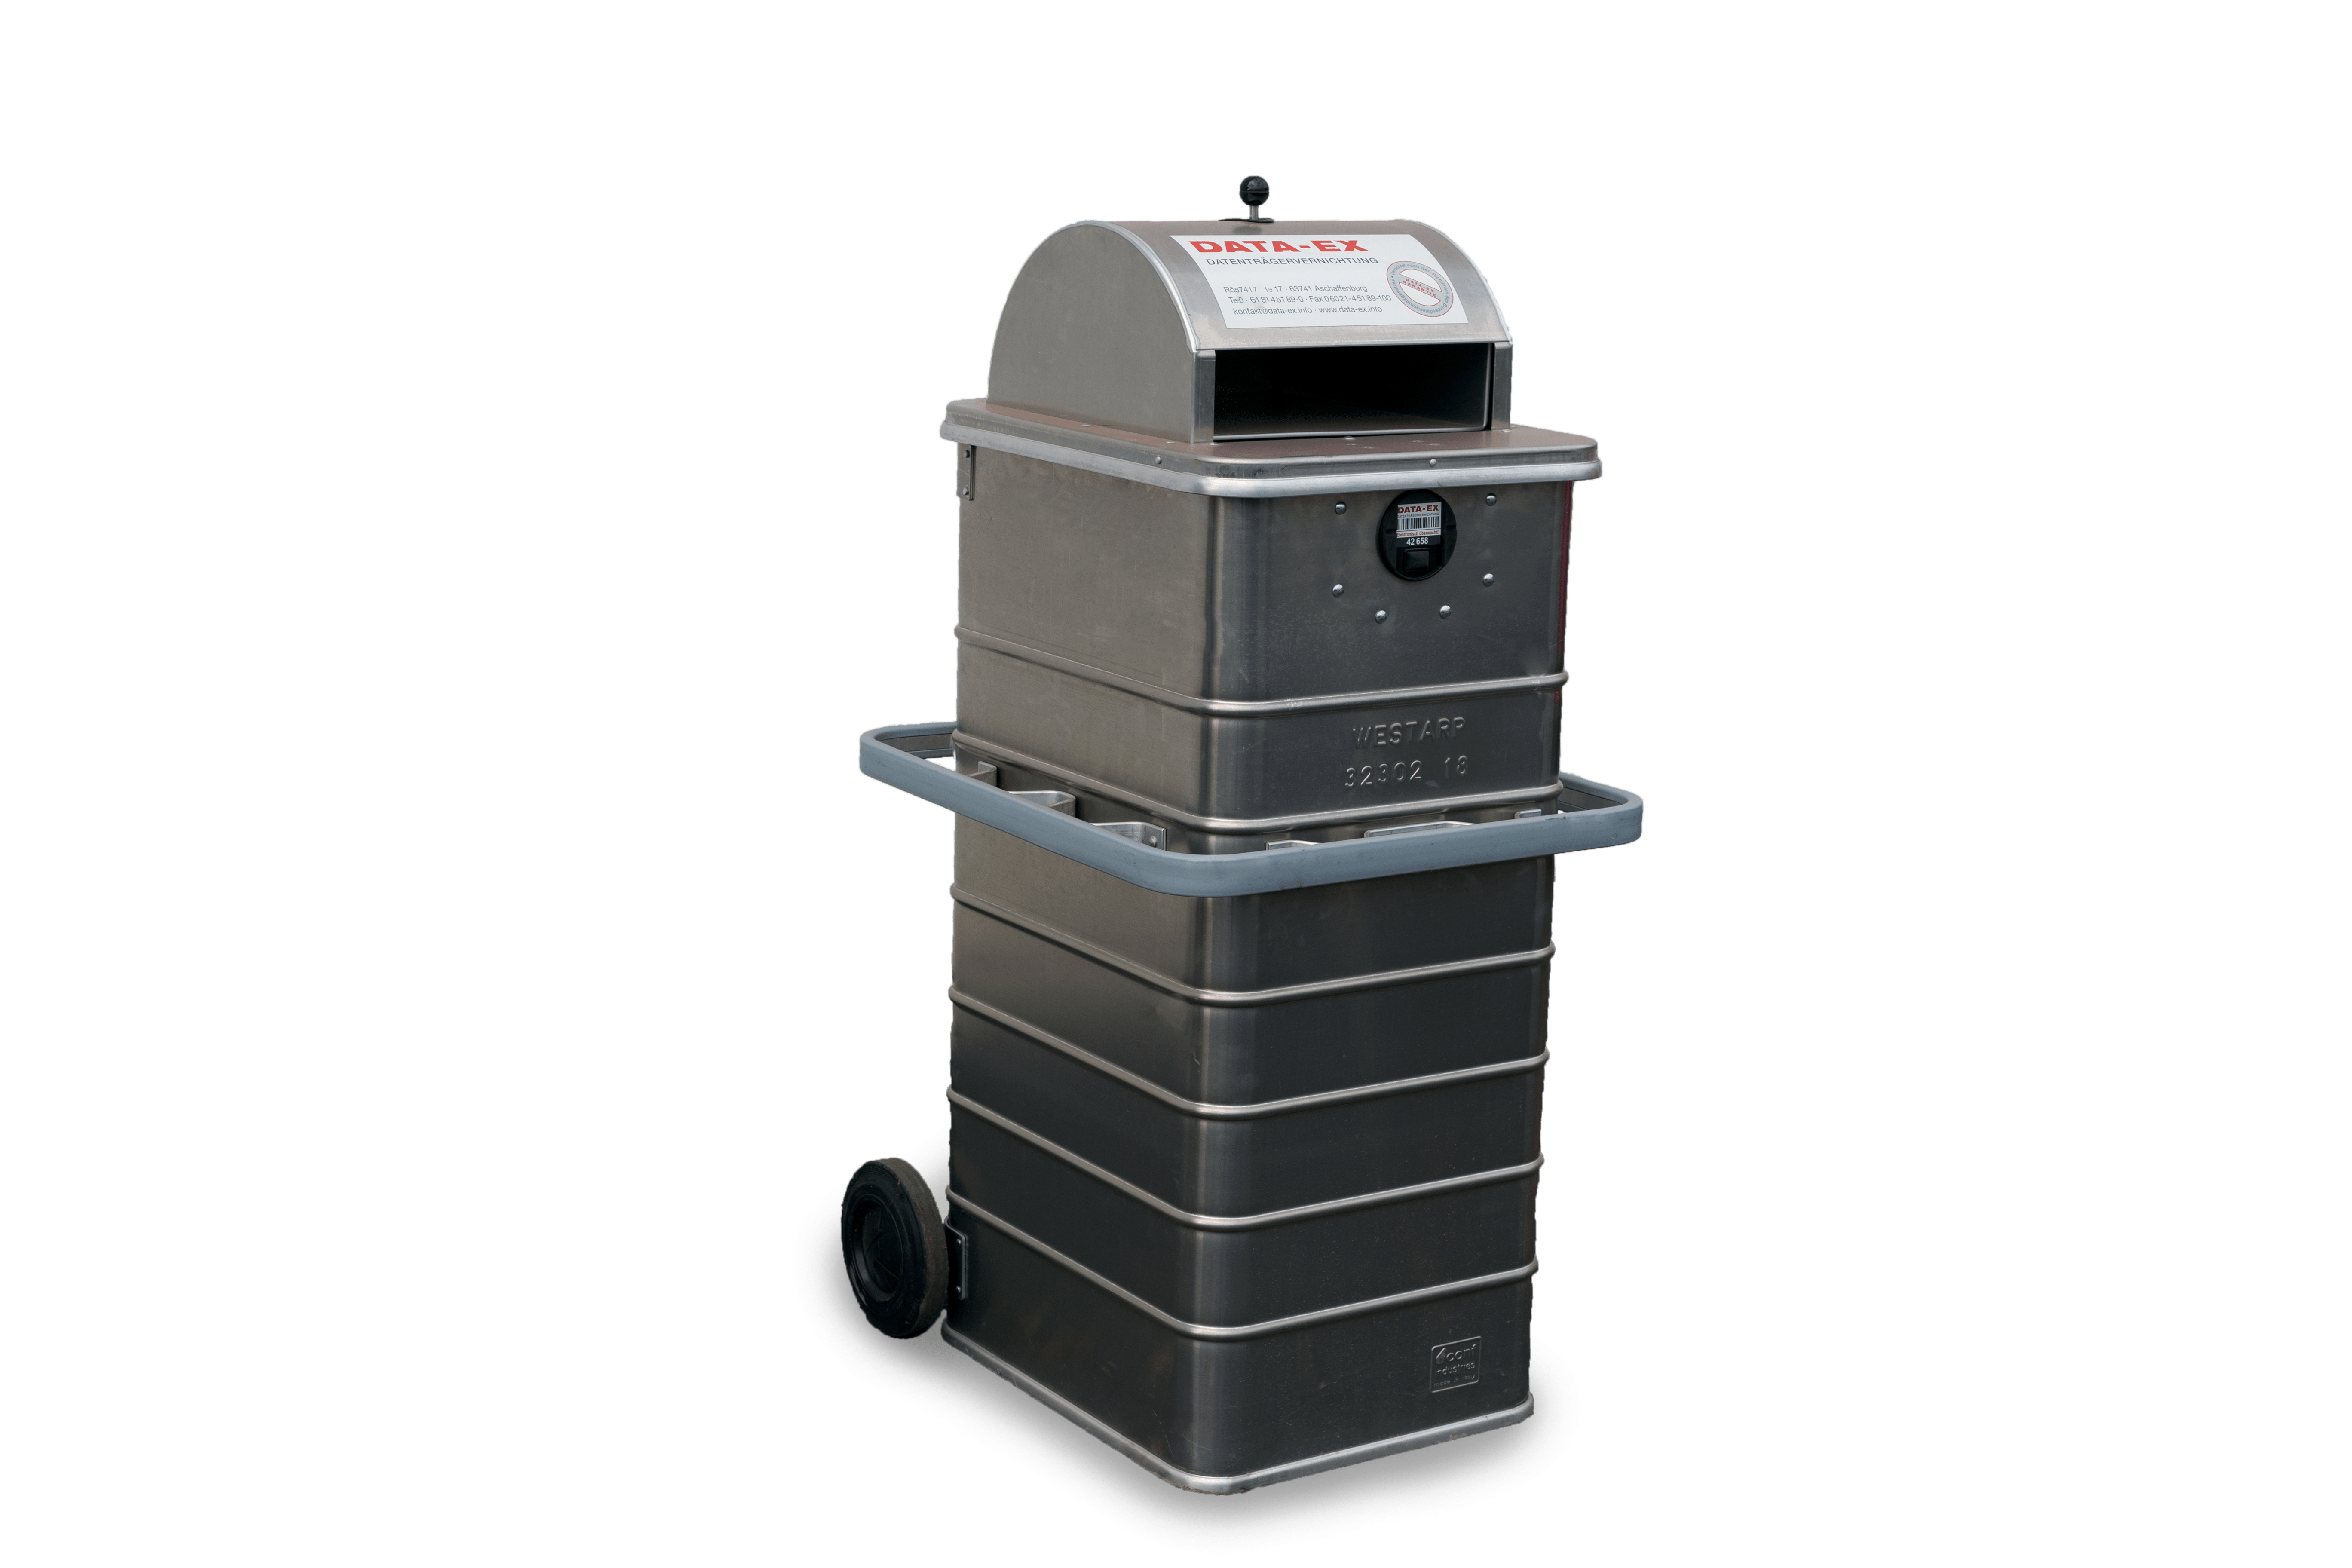 Schleusenbehälter 240 Liter Elektronisch verschließbar